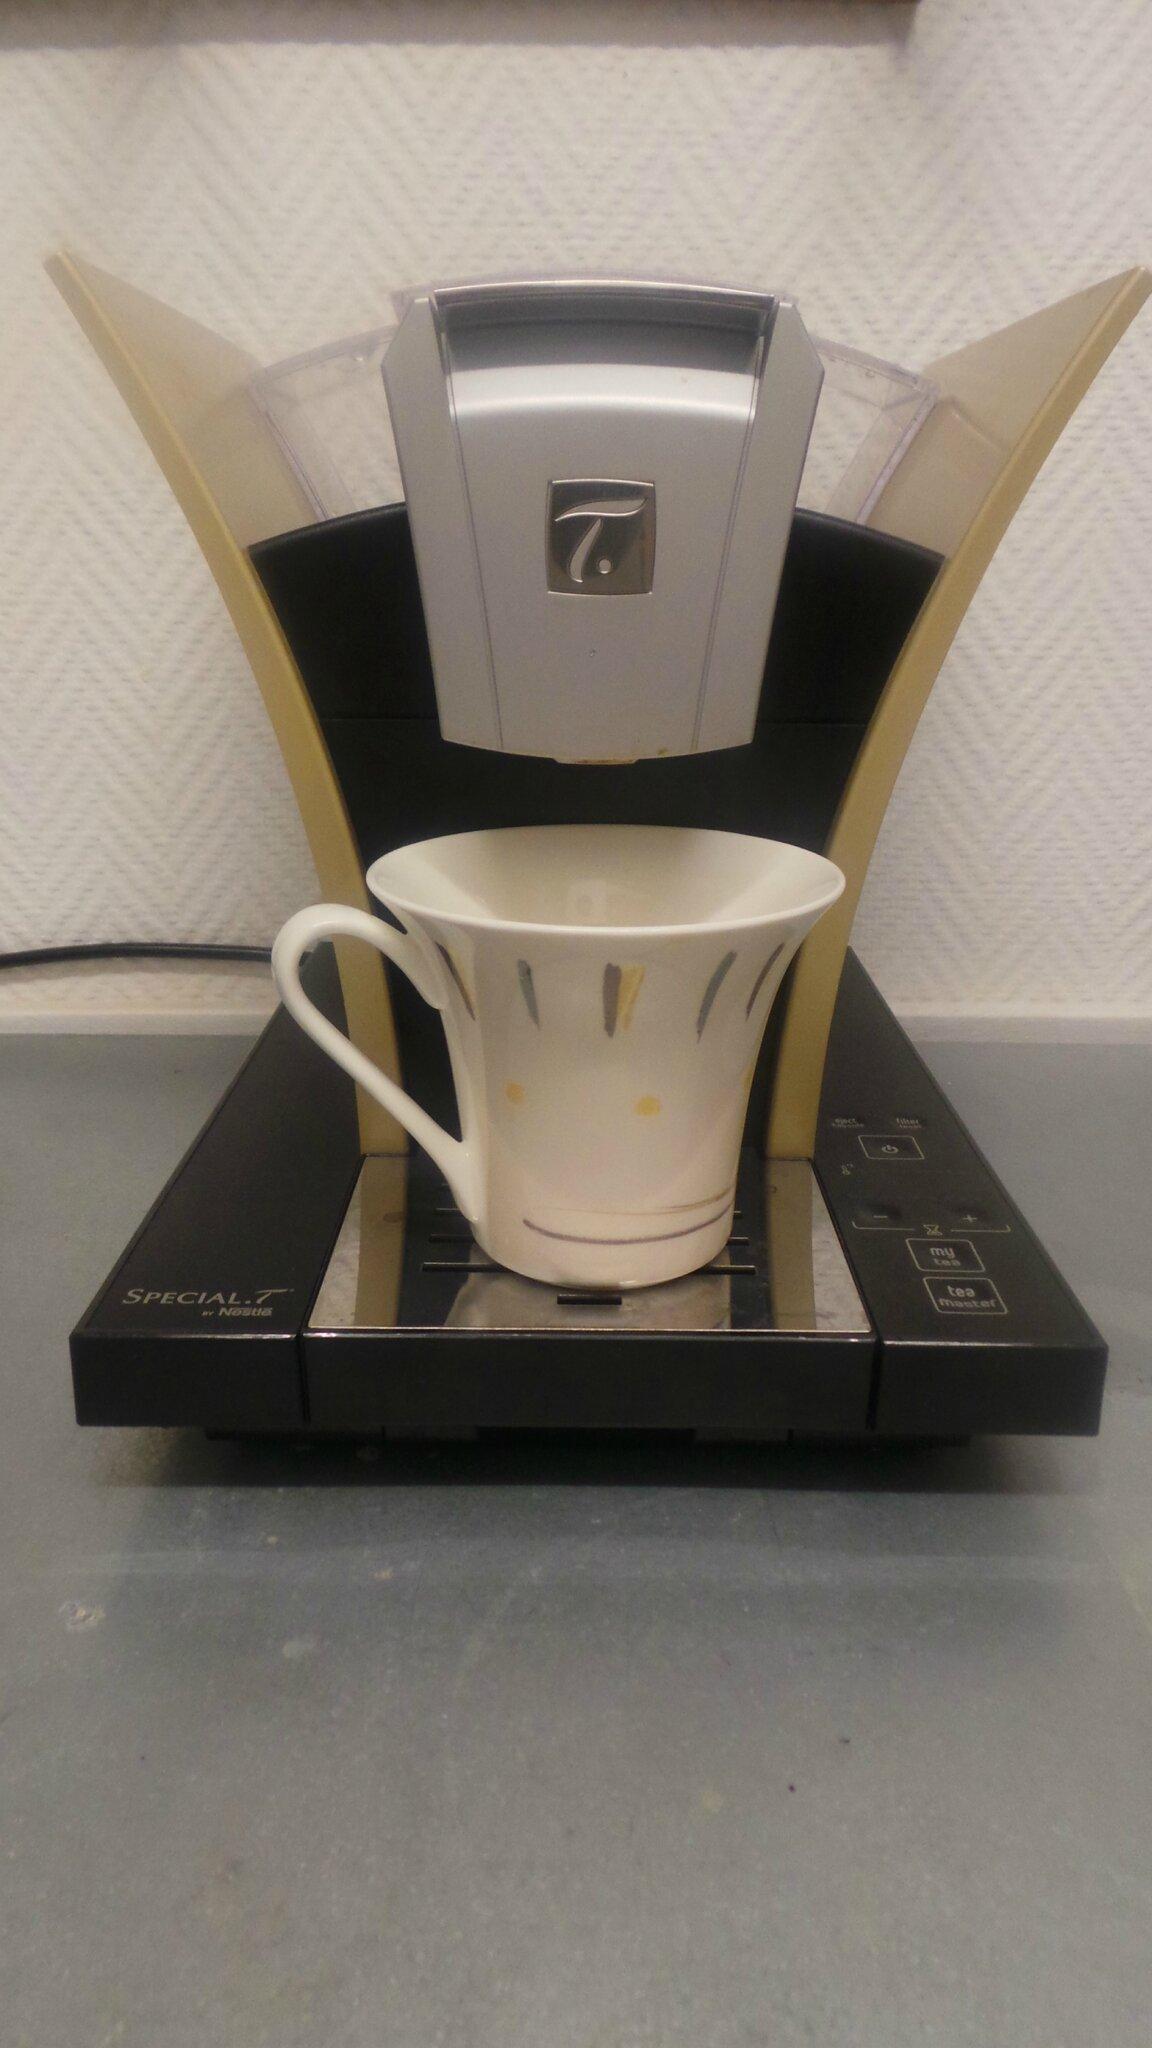 machine dosette cool machine caf dosette noir intense. Black Bedroom Furniture Sets. Home Design Ideas